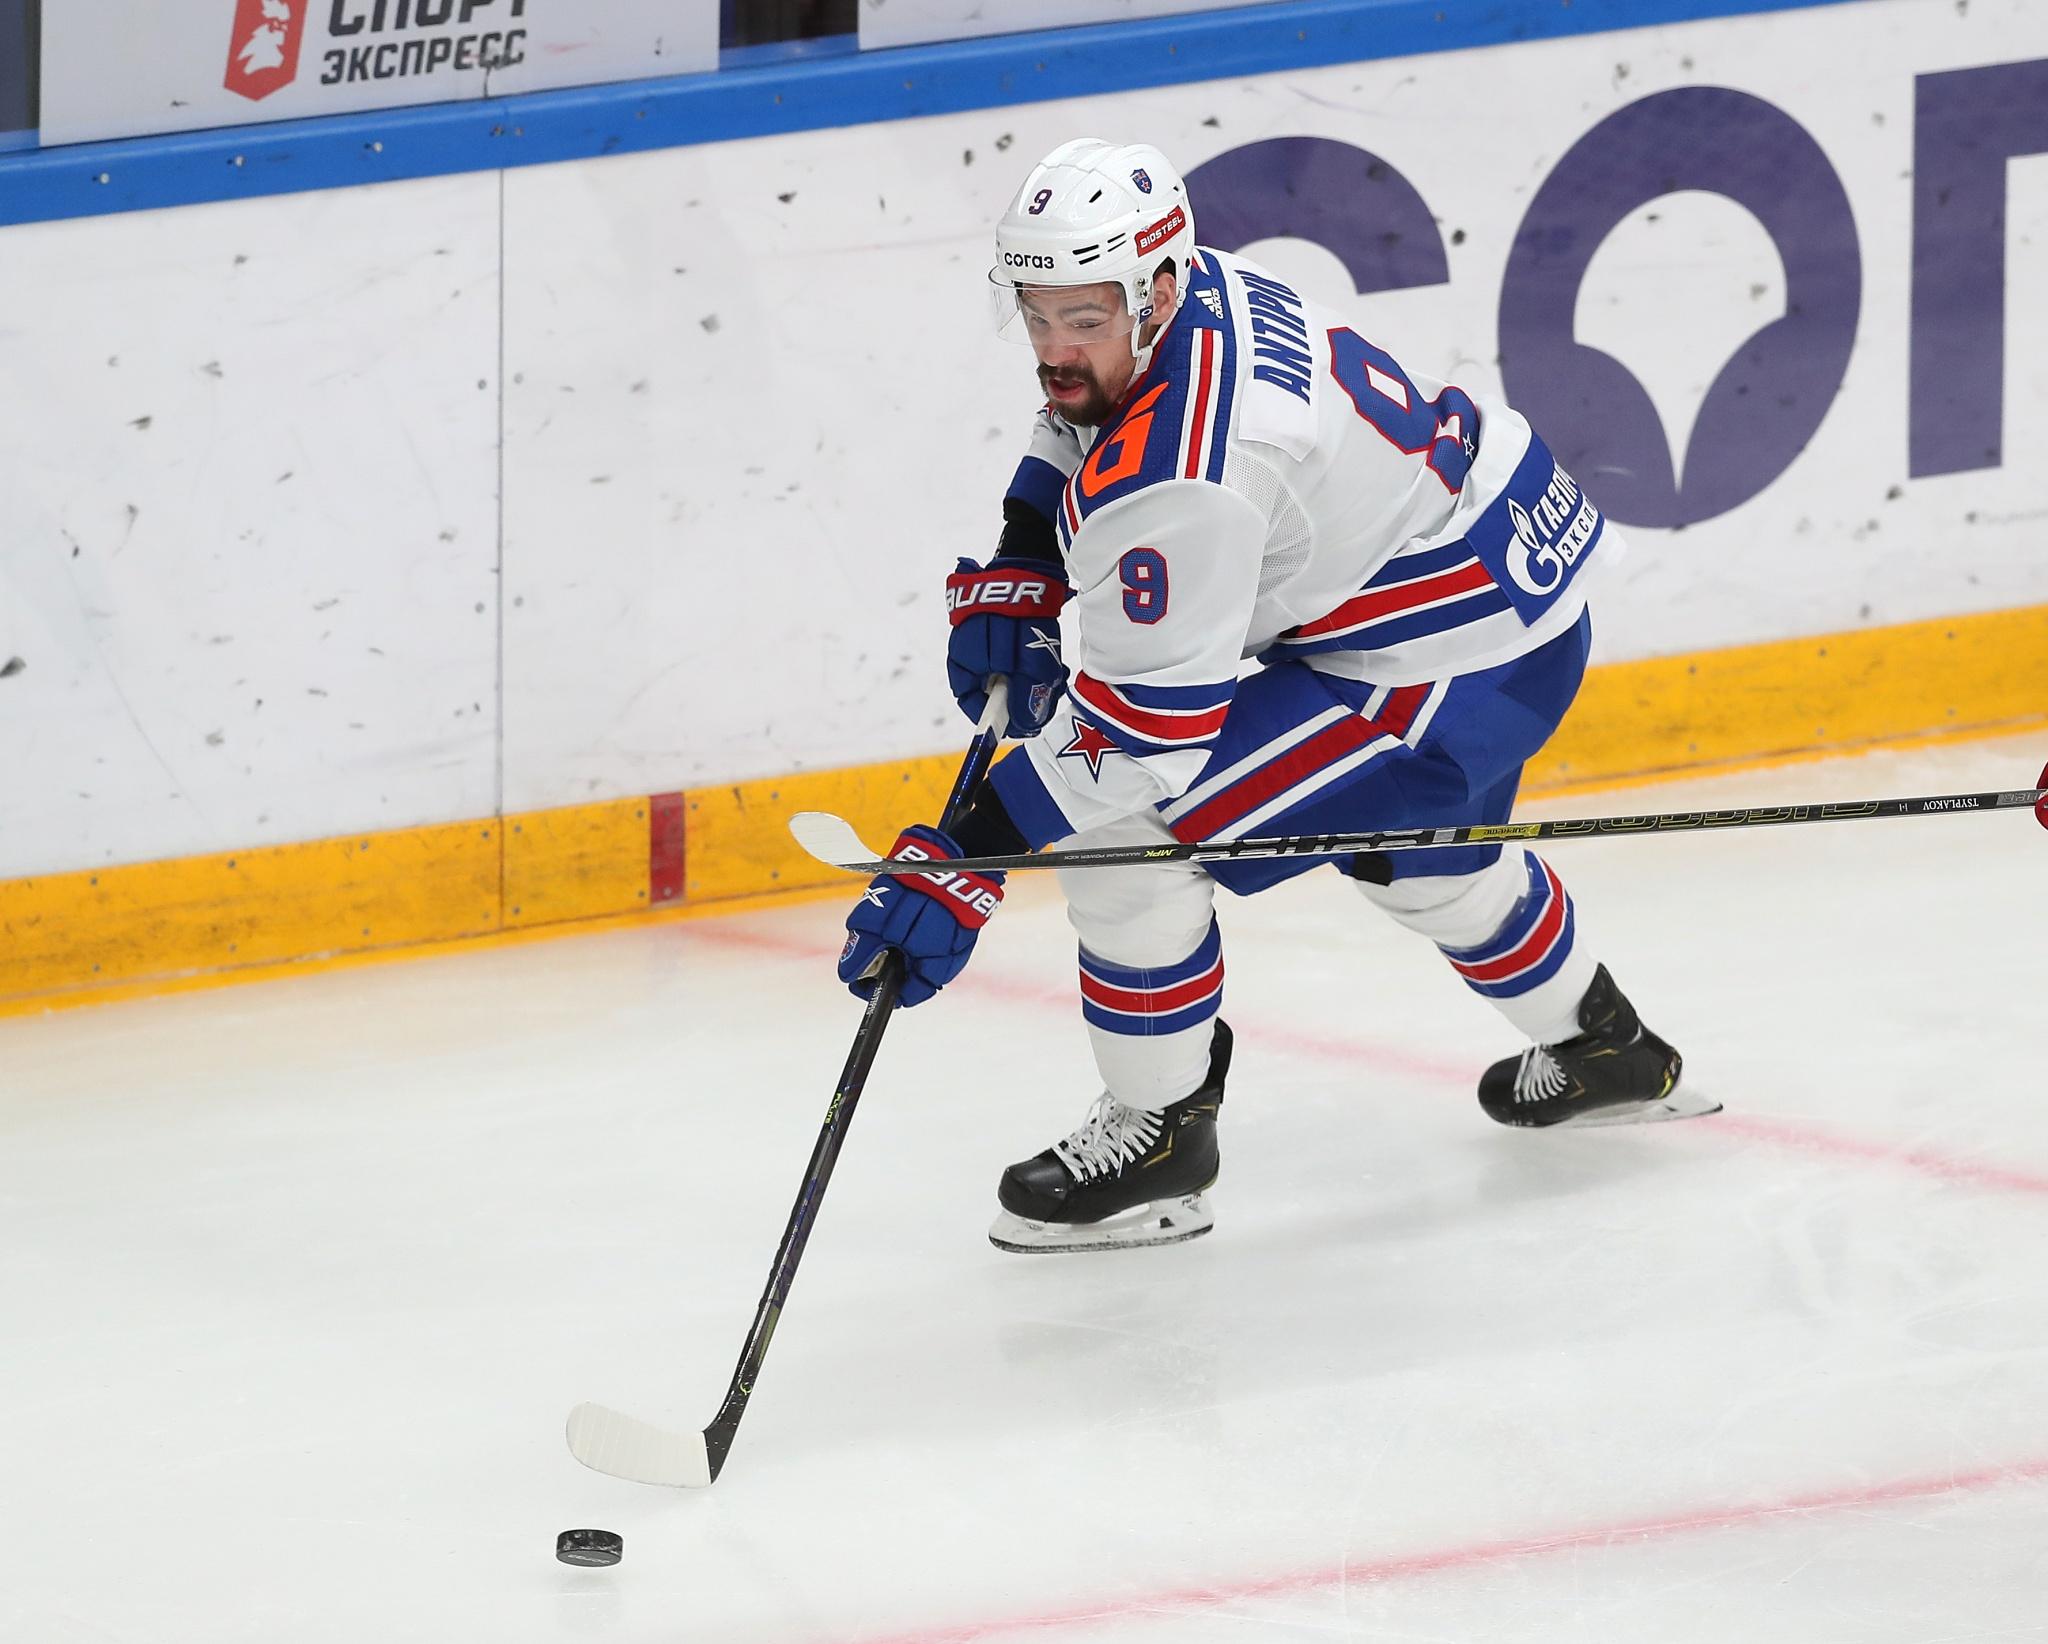 Виктор Антипин. Фото: Юрий Кузьмин